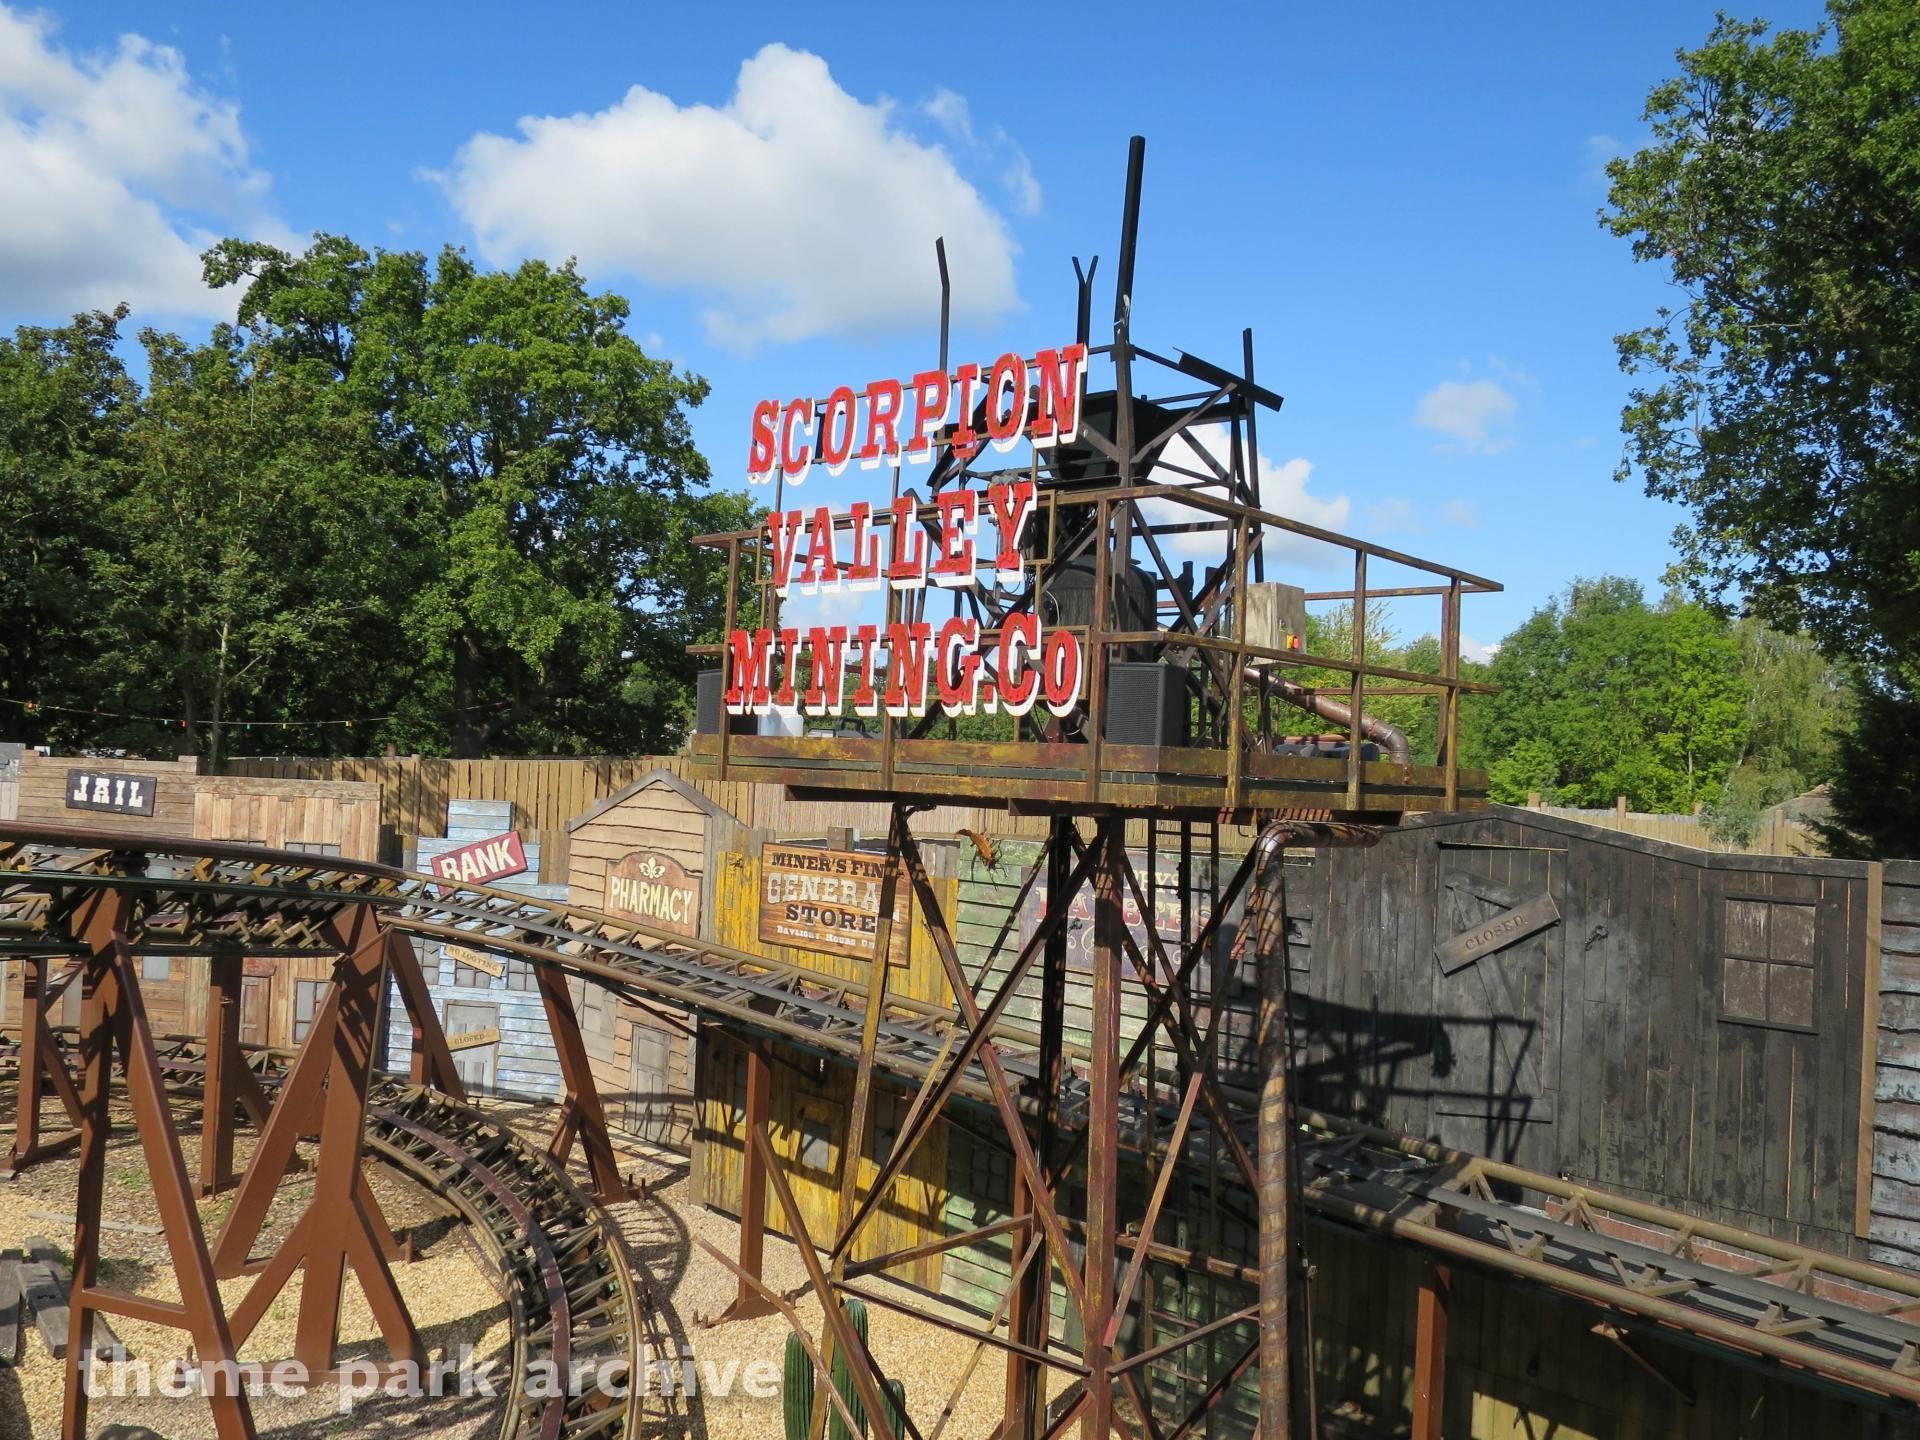 Scorpion Express at Chessington World of Adventures Resort